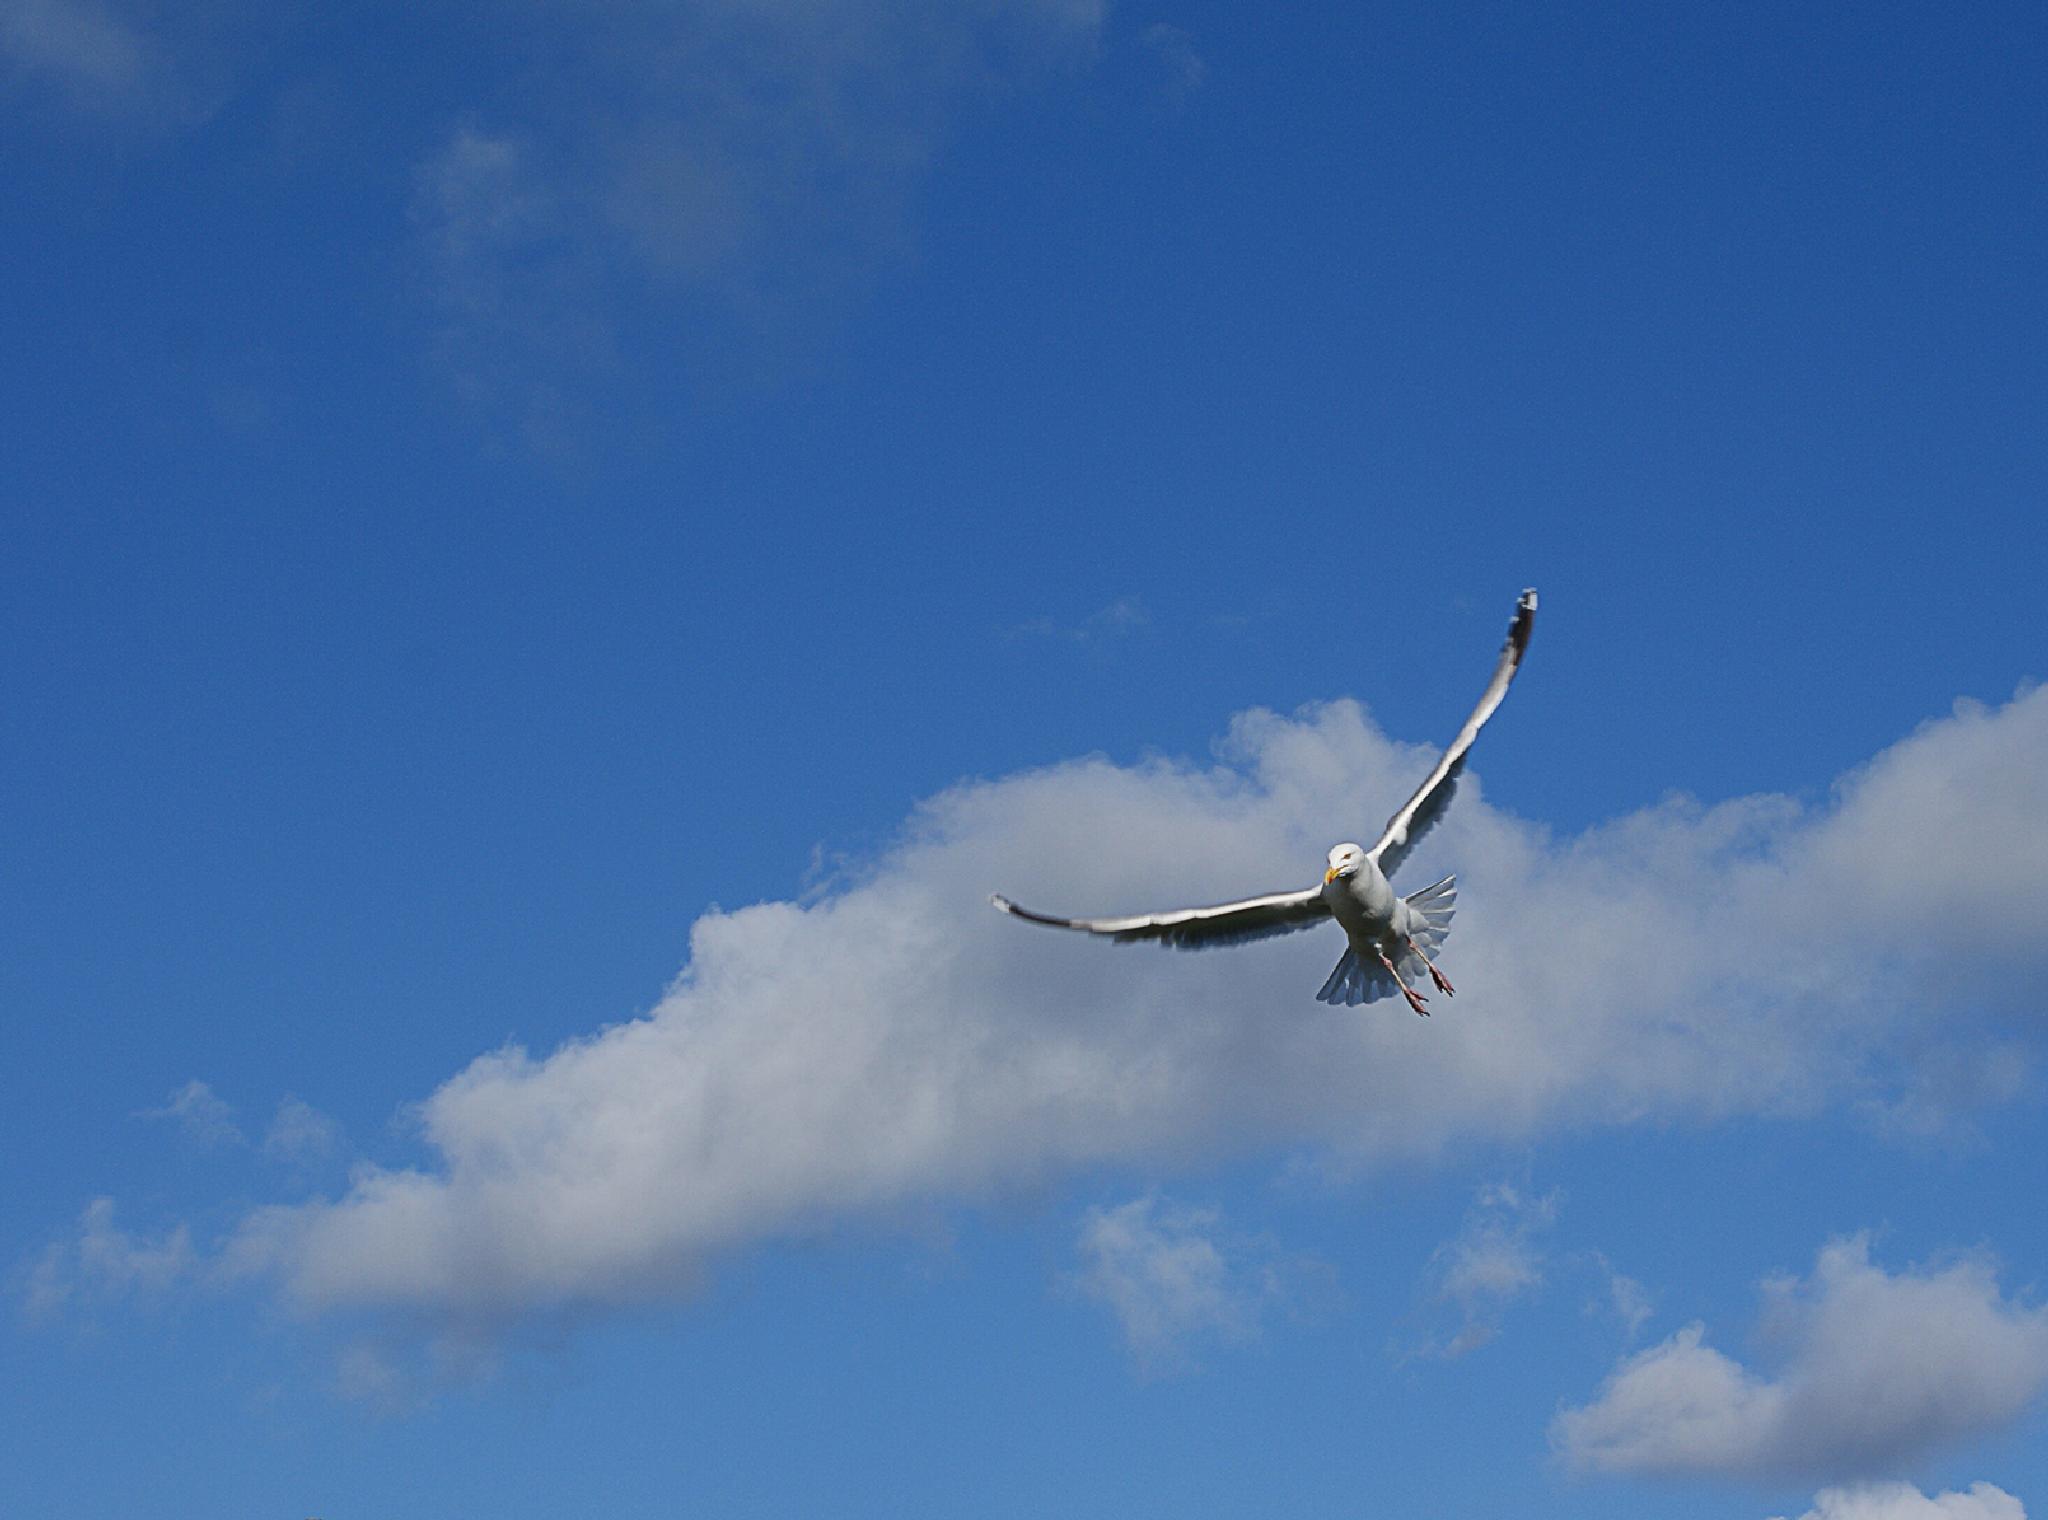 bird in the sky by gerhard.buis